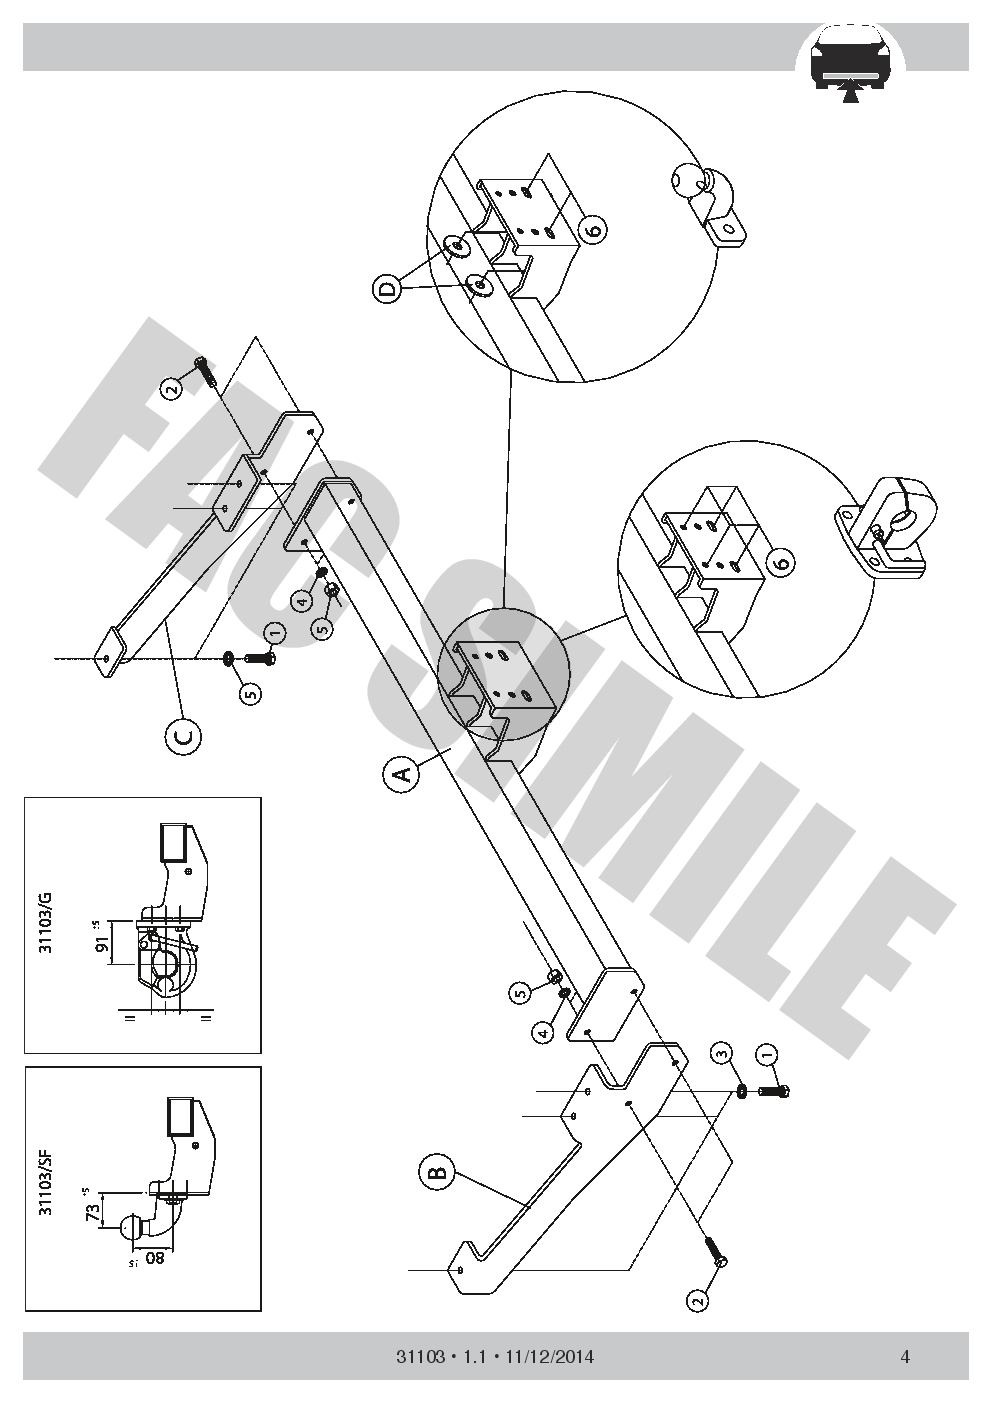 13pin Wiring C2 for Opel Vauxhall Vivaro Van 2014 On 31/_A1 Fixed Flange towbar